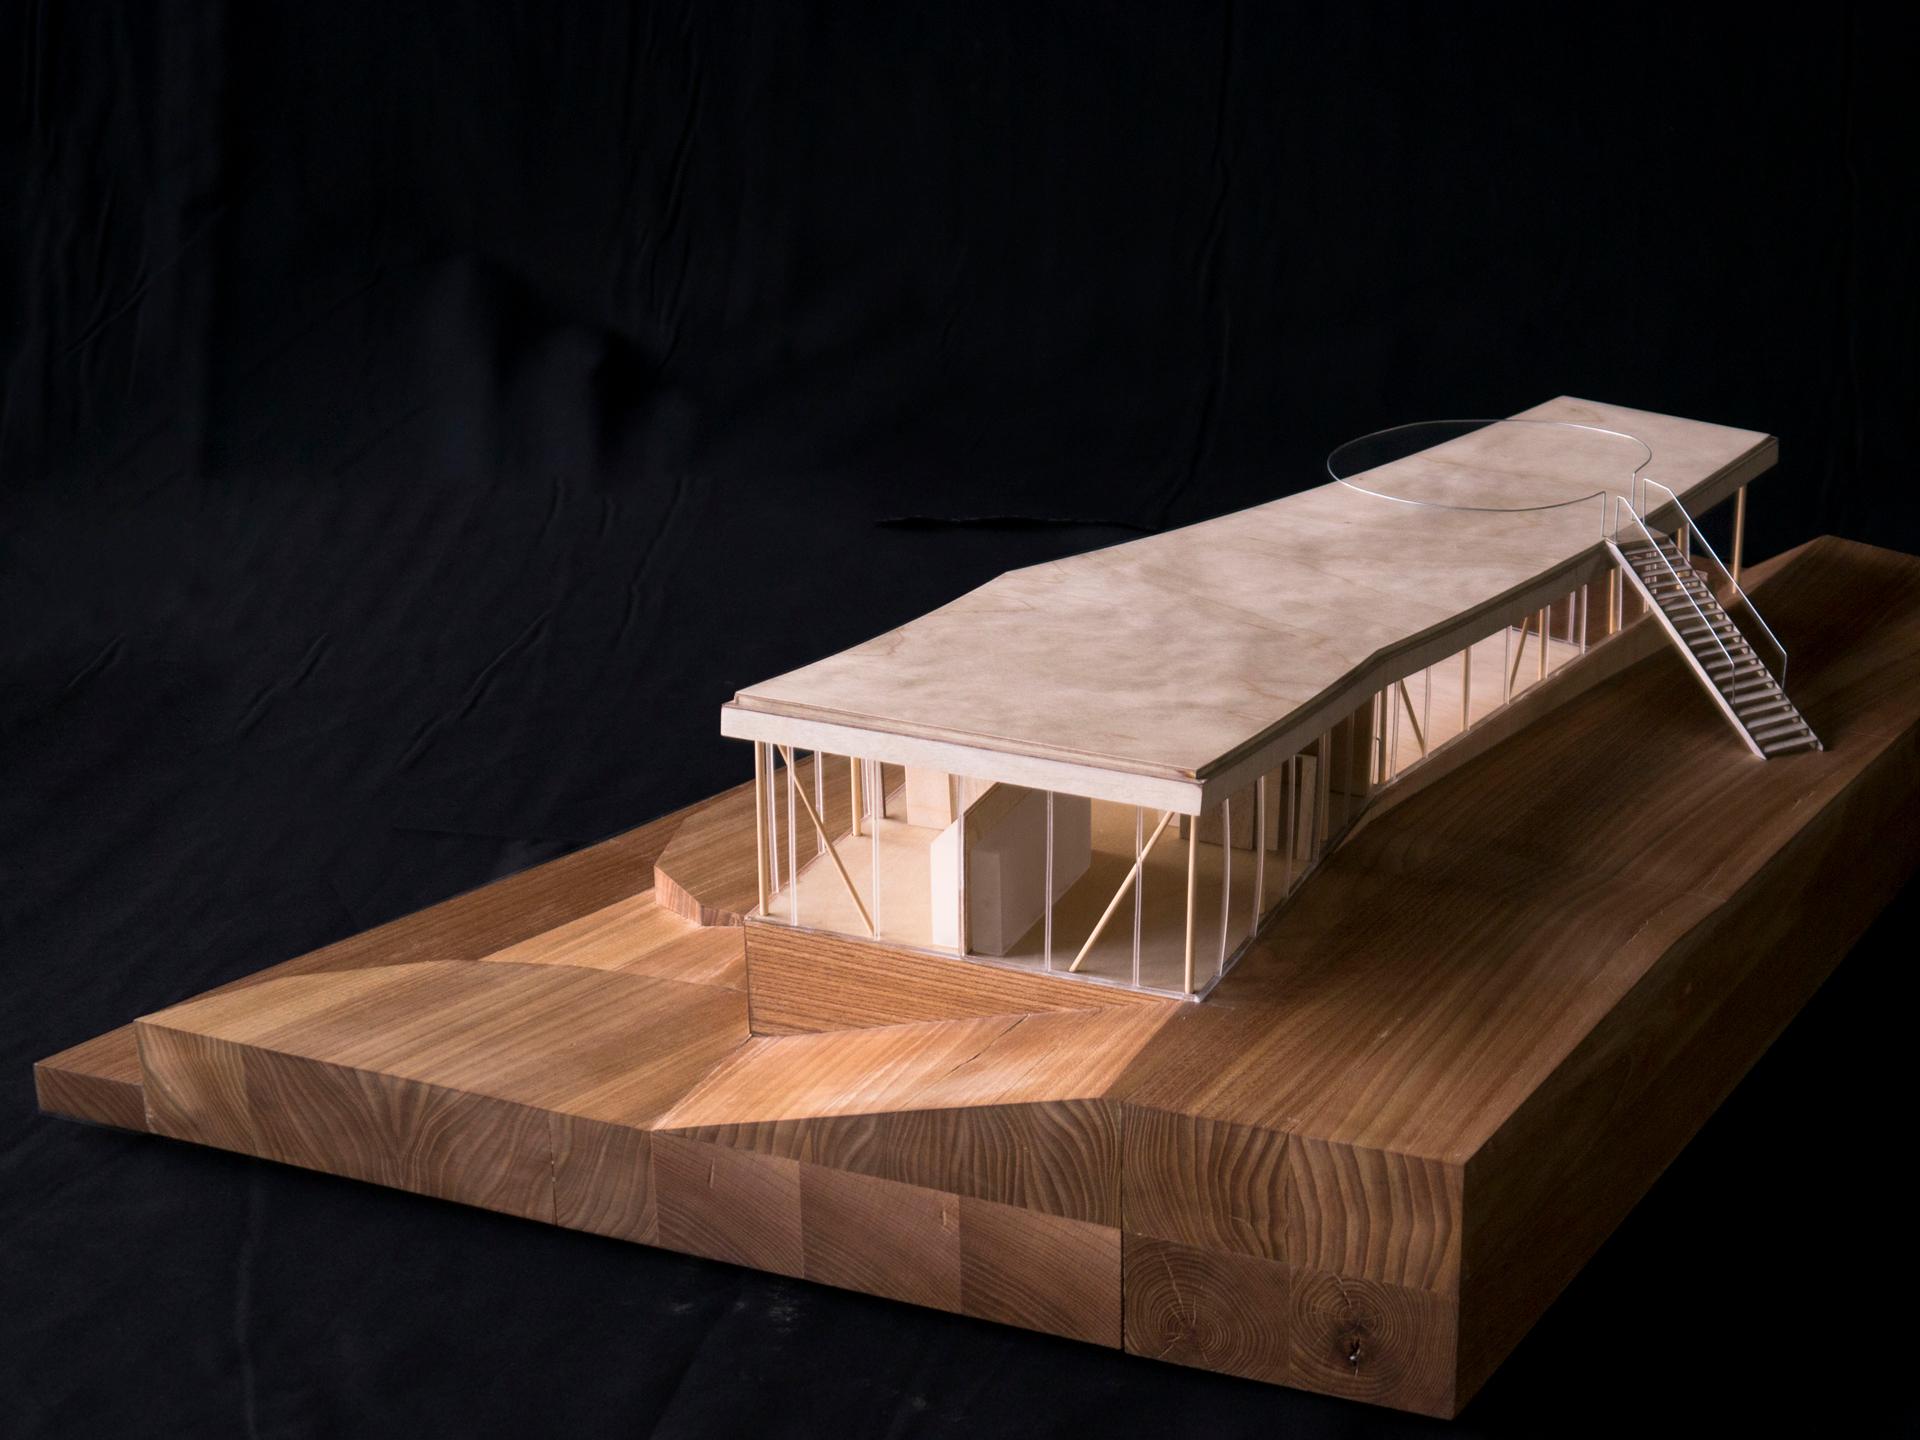 Holzmodell 1:50 aus Pappelsperrholz und massivem Ulmenholz